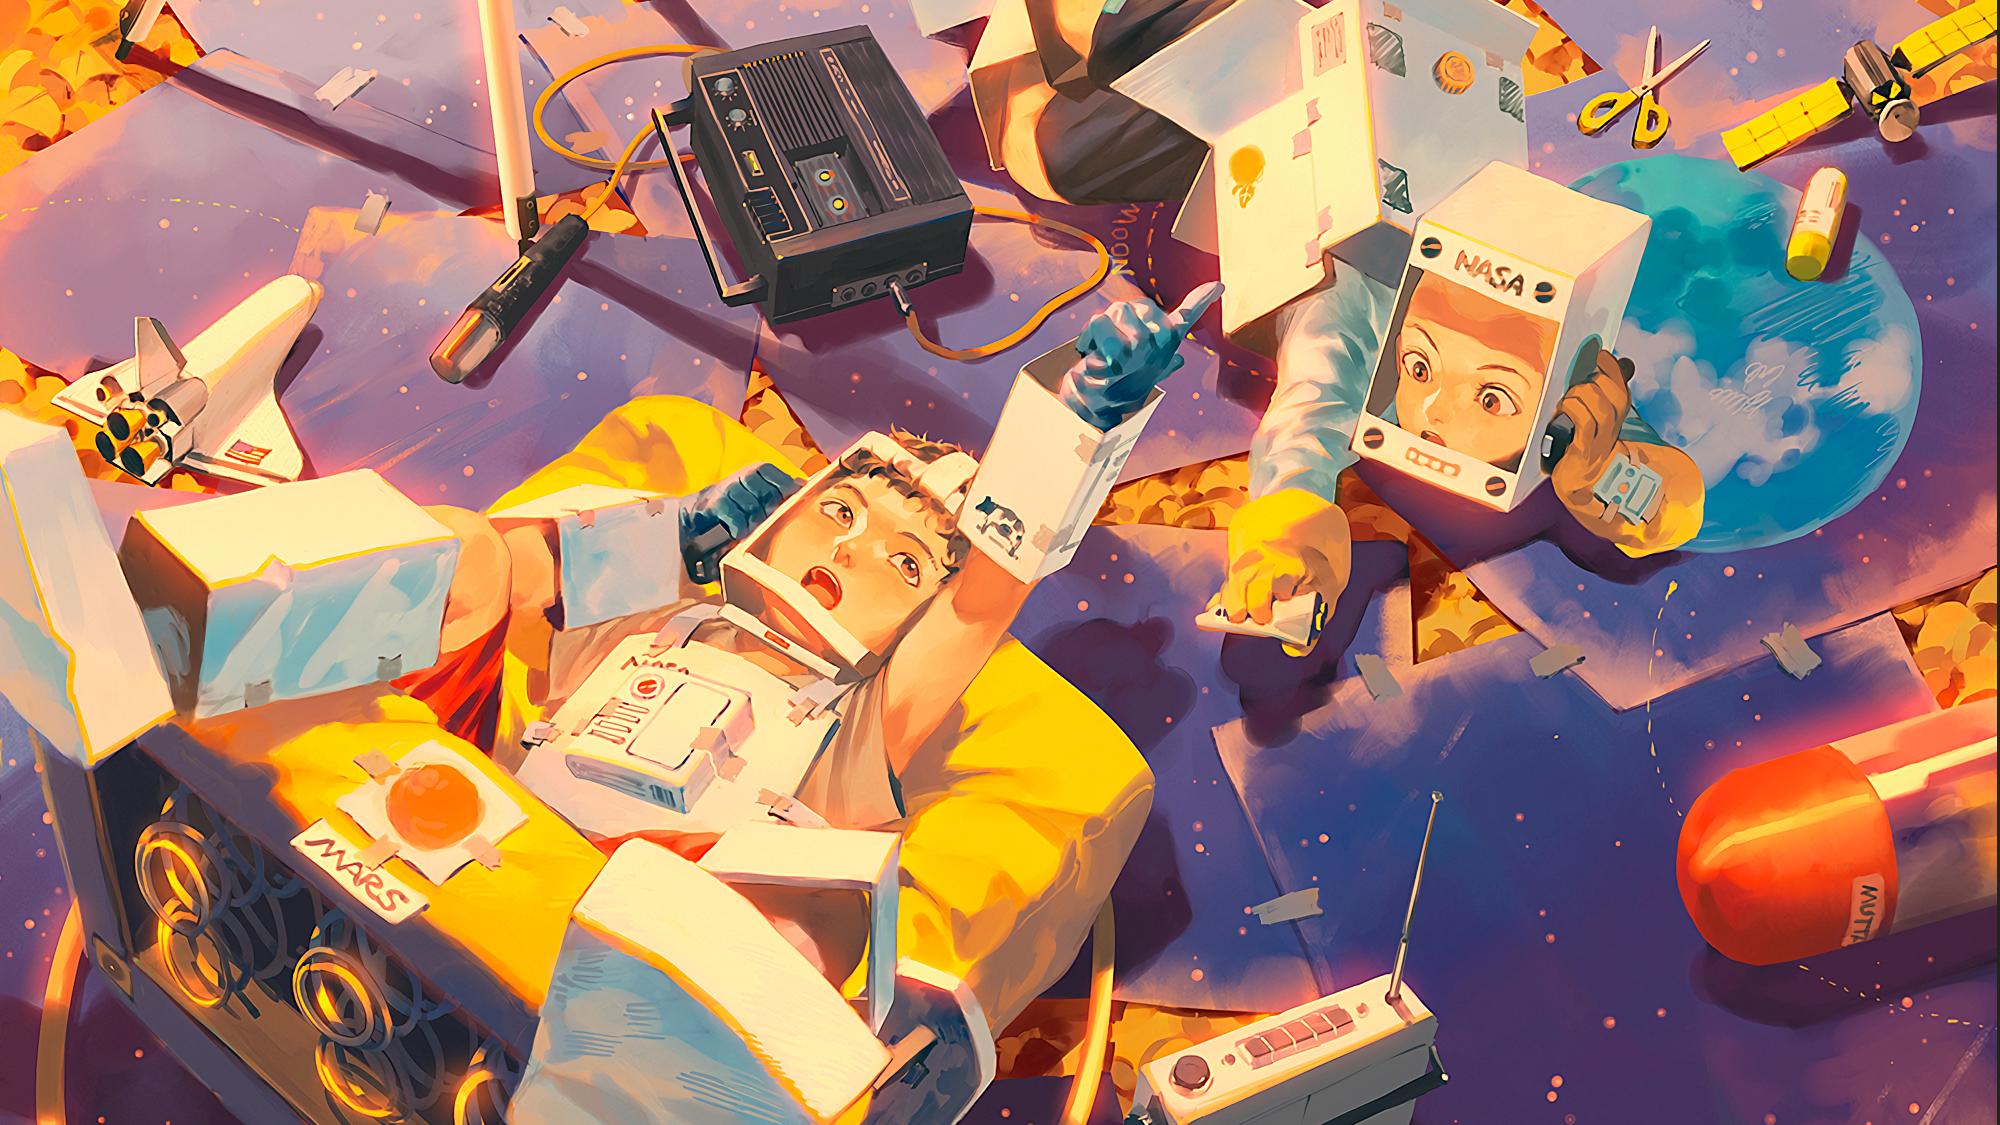 General 2000x1125 astronaut playing children space digital art artwork